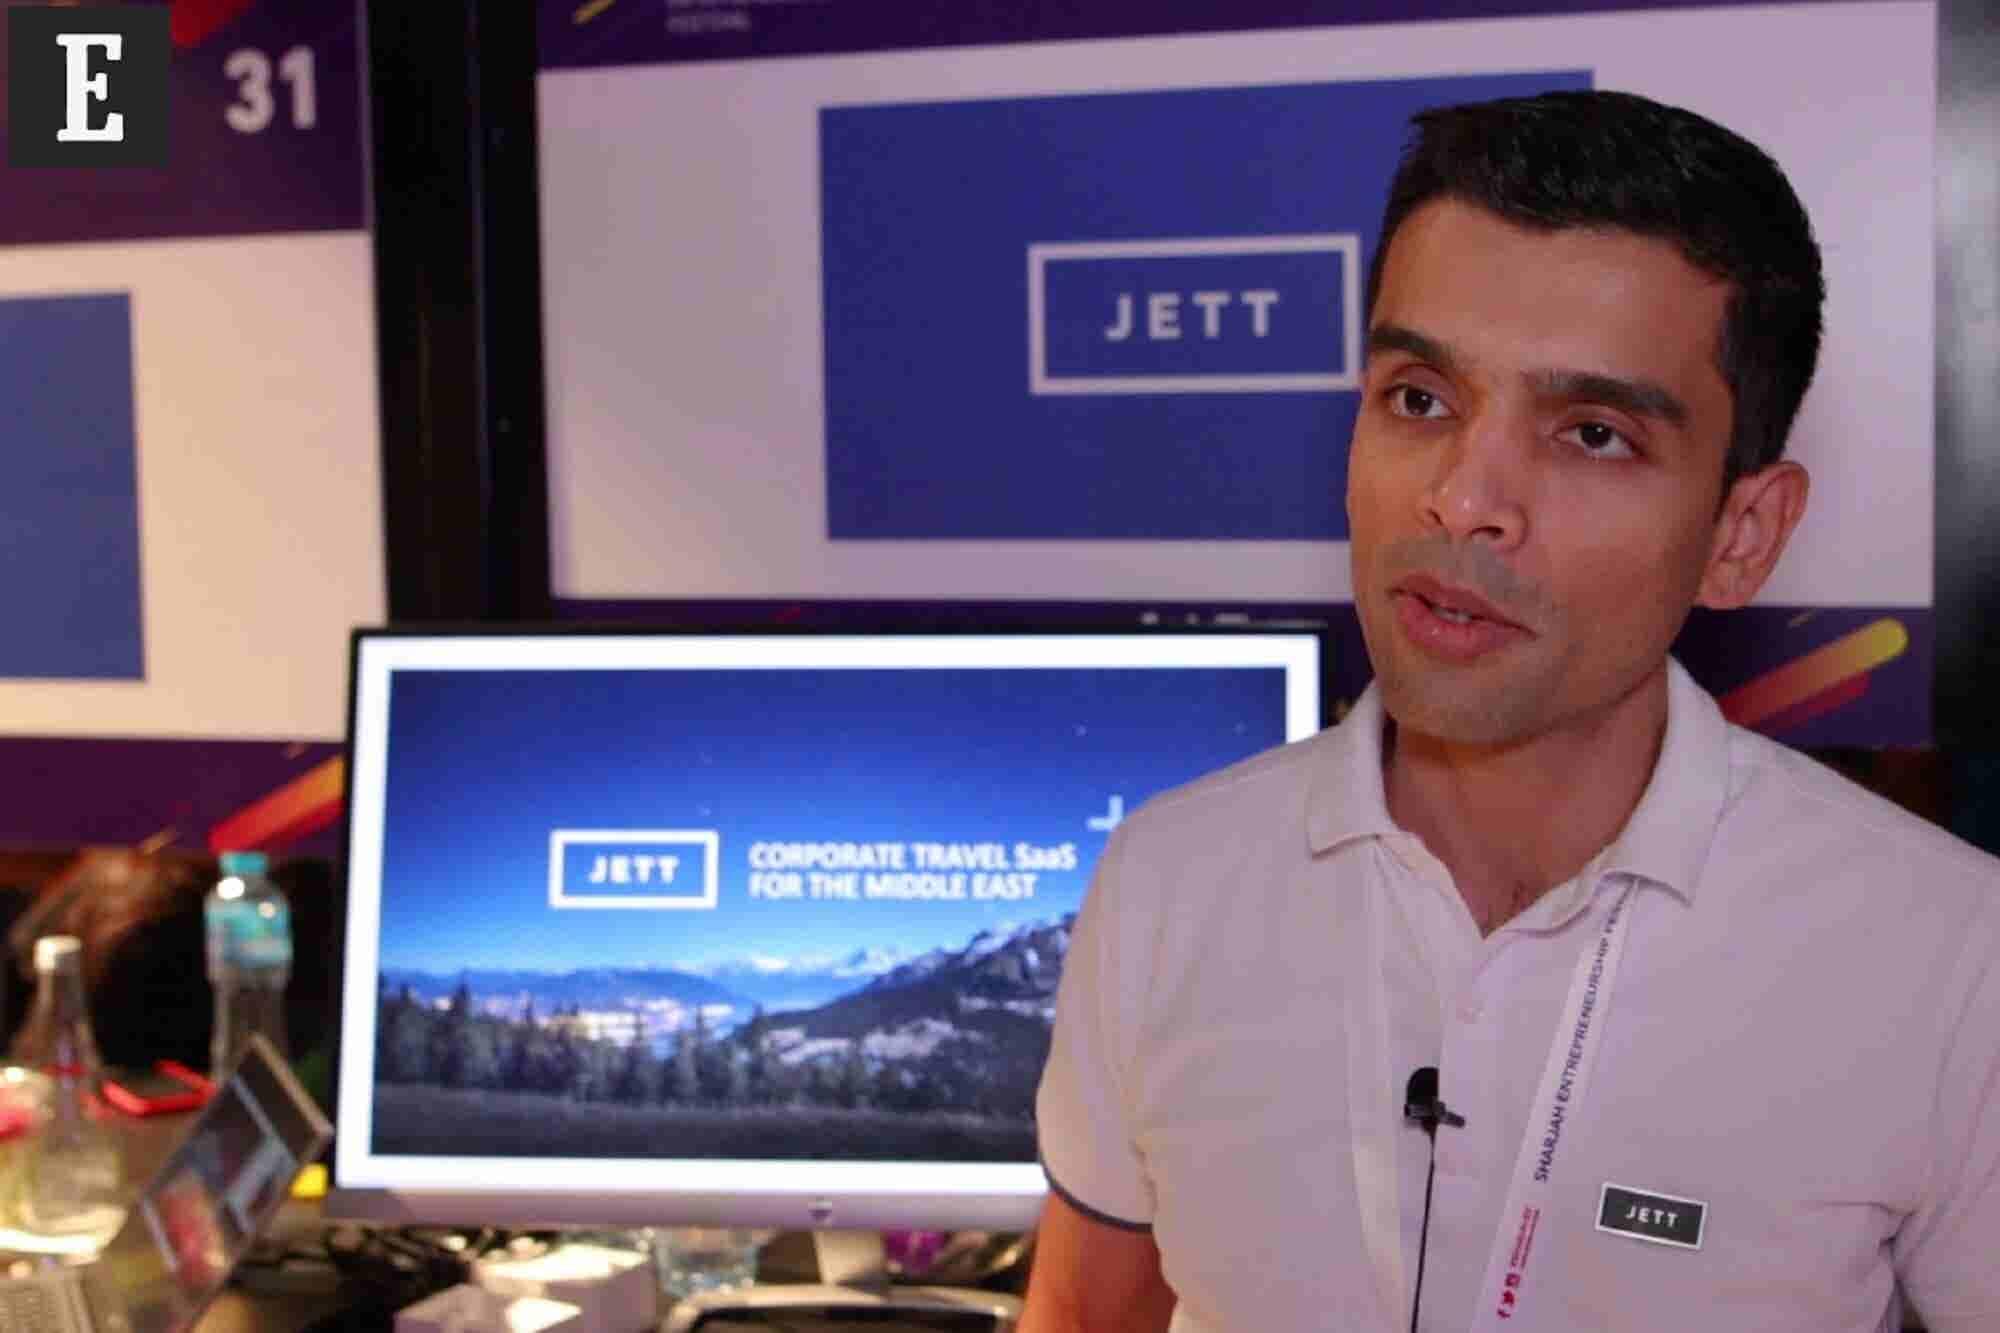 Dubai Startup Jett's Albert Dias Advises Aspiring 'Treps To Cultivate Passion In Their Endeavors